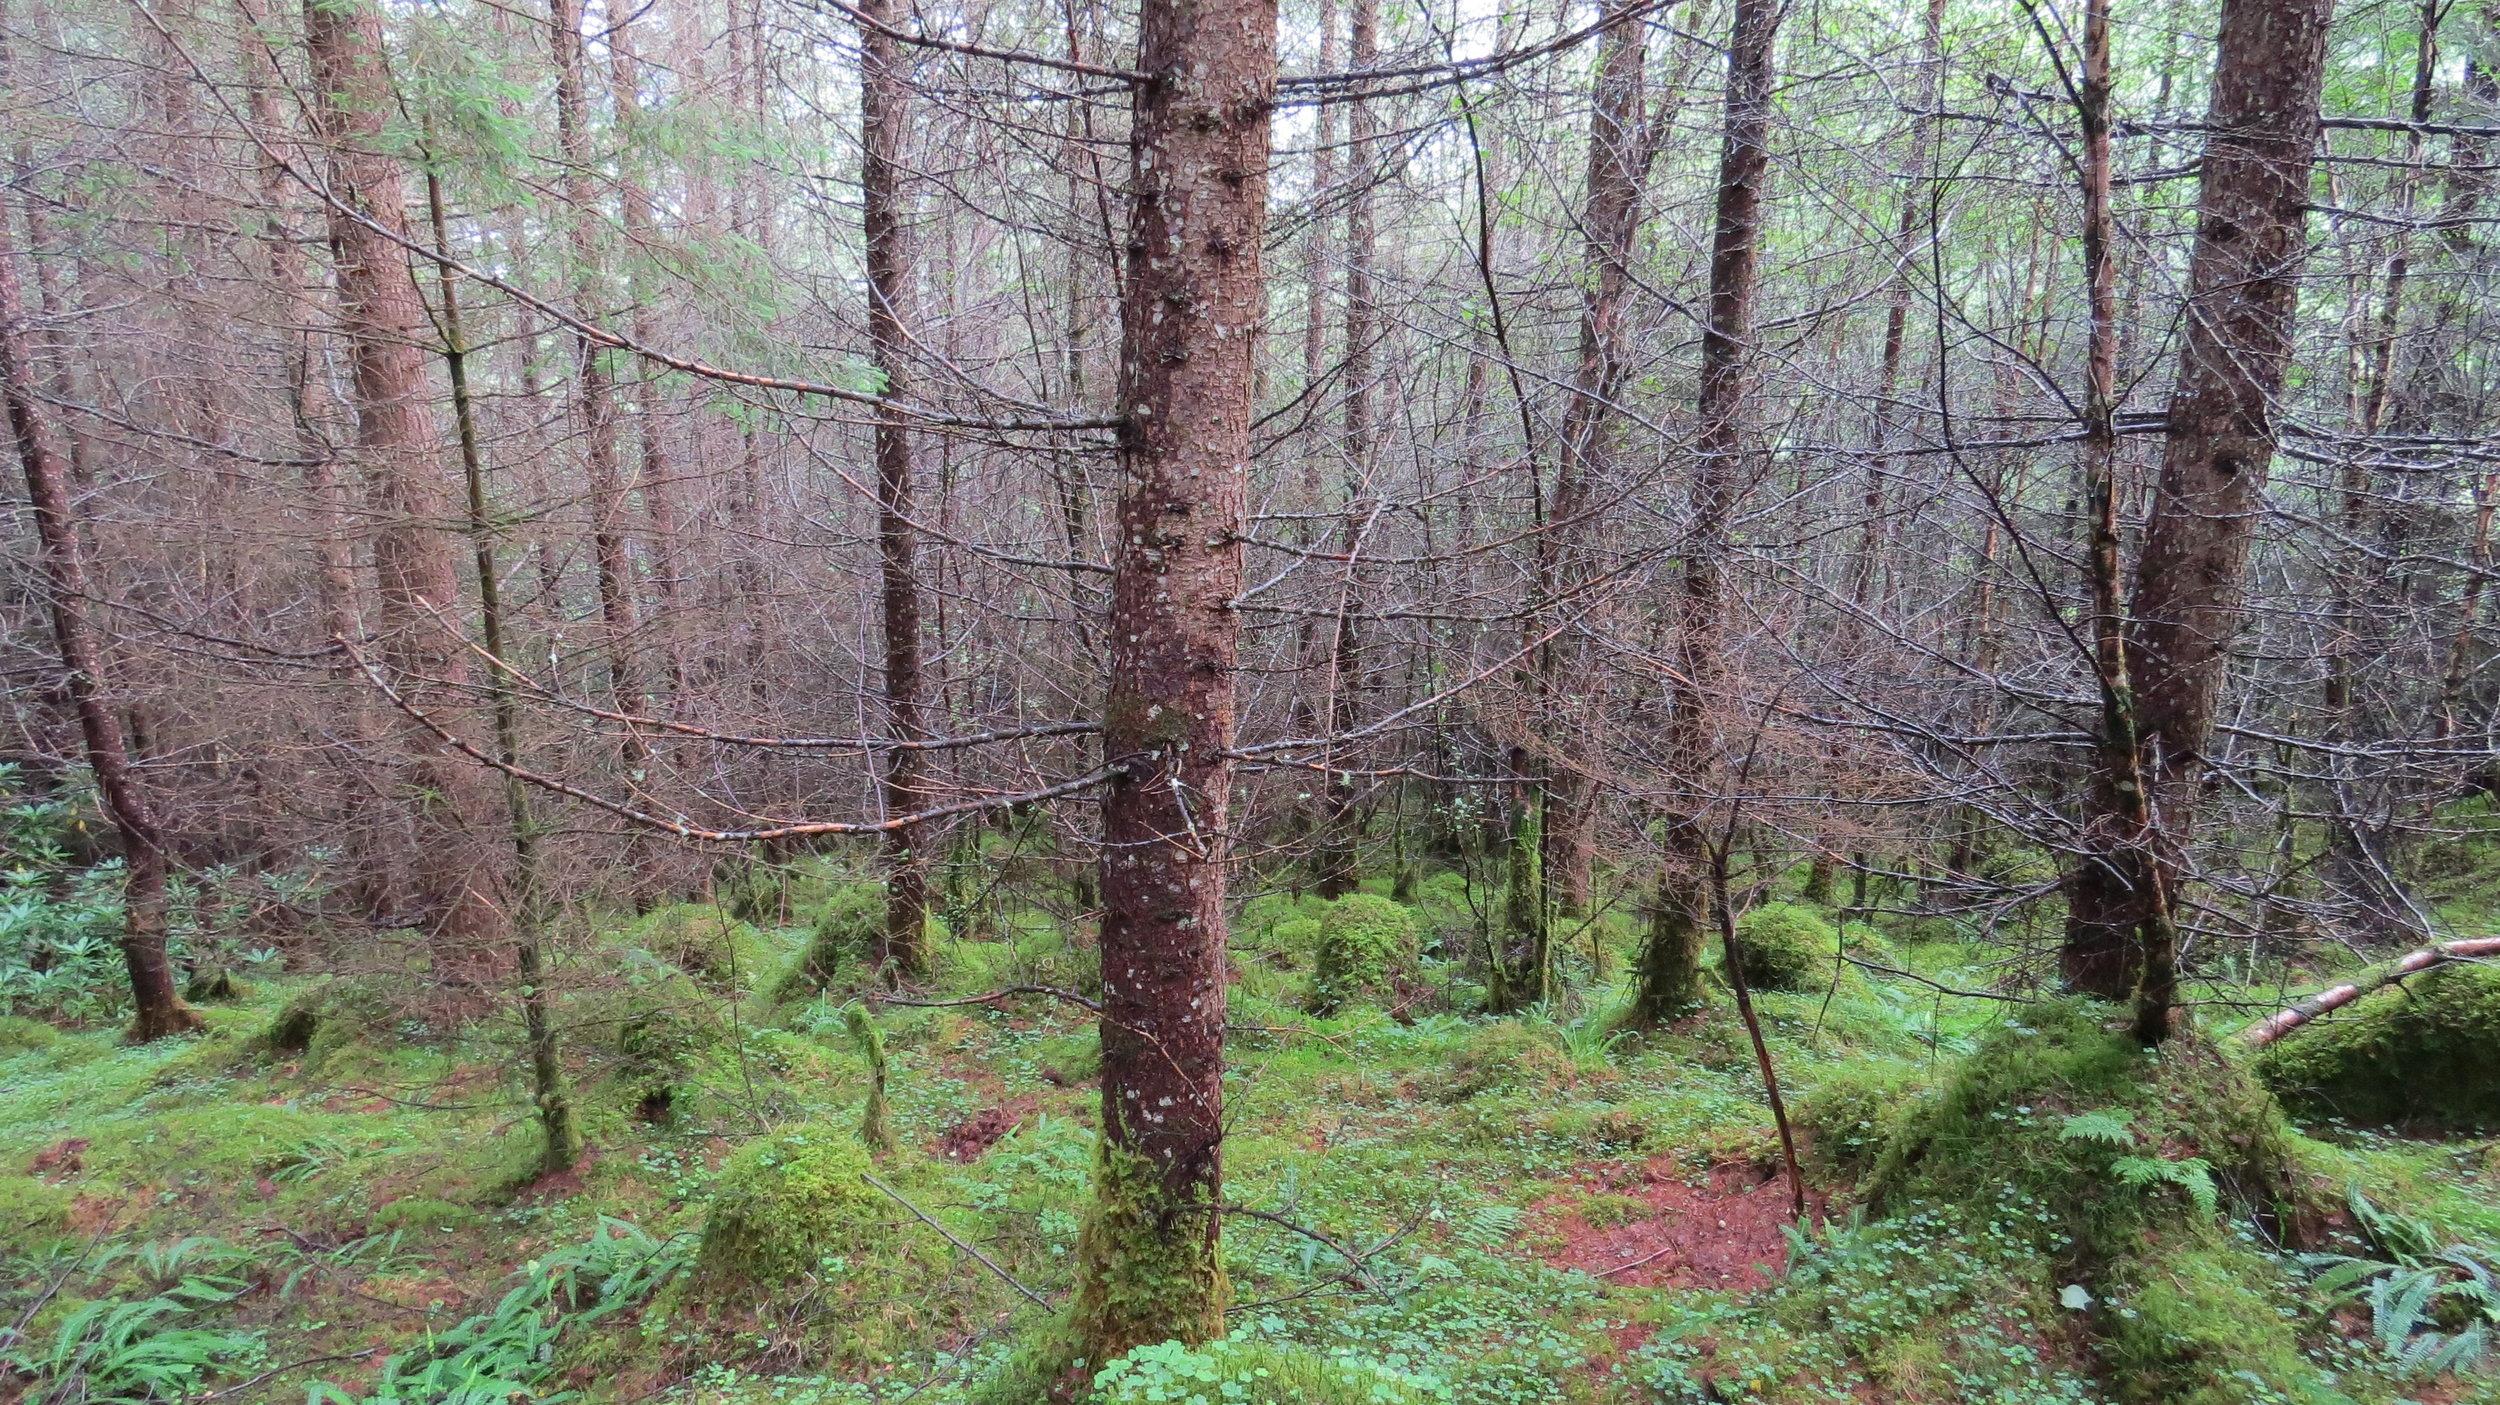 Descending though Pines (Easy Part)